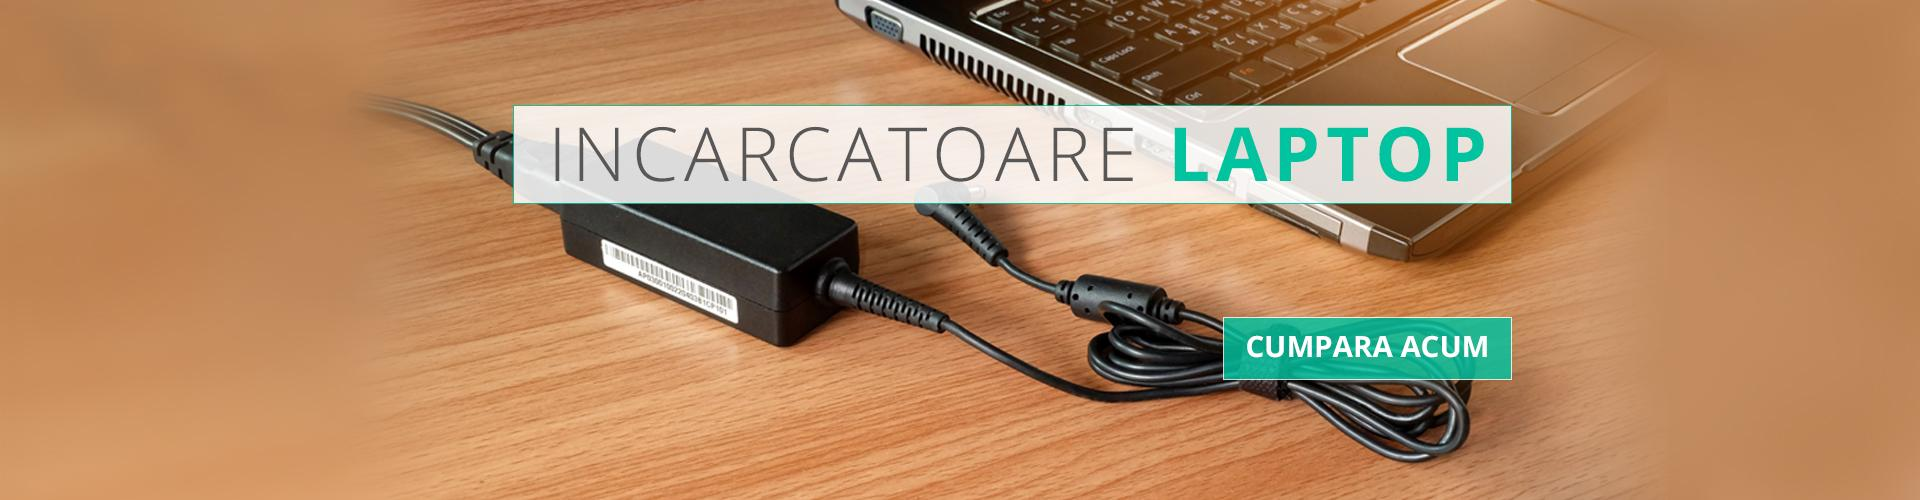 Banner_incarcator_laptop-1920x500